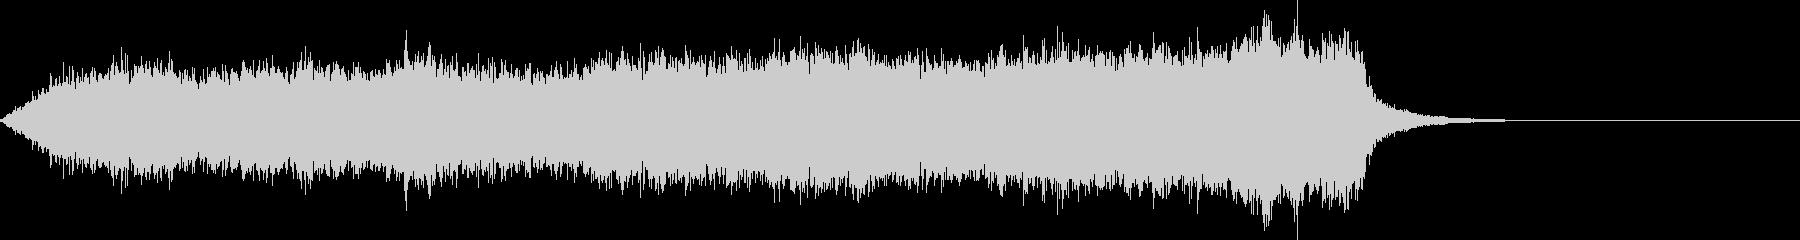 CINEMATIC RISER_04の未再生の波形